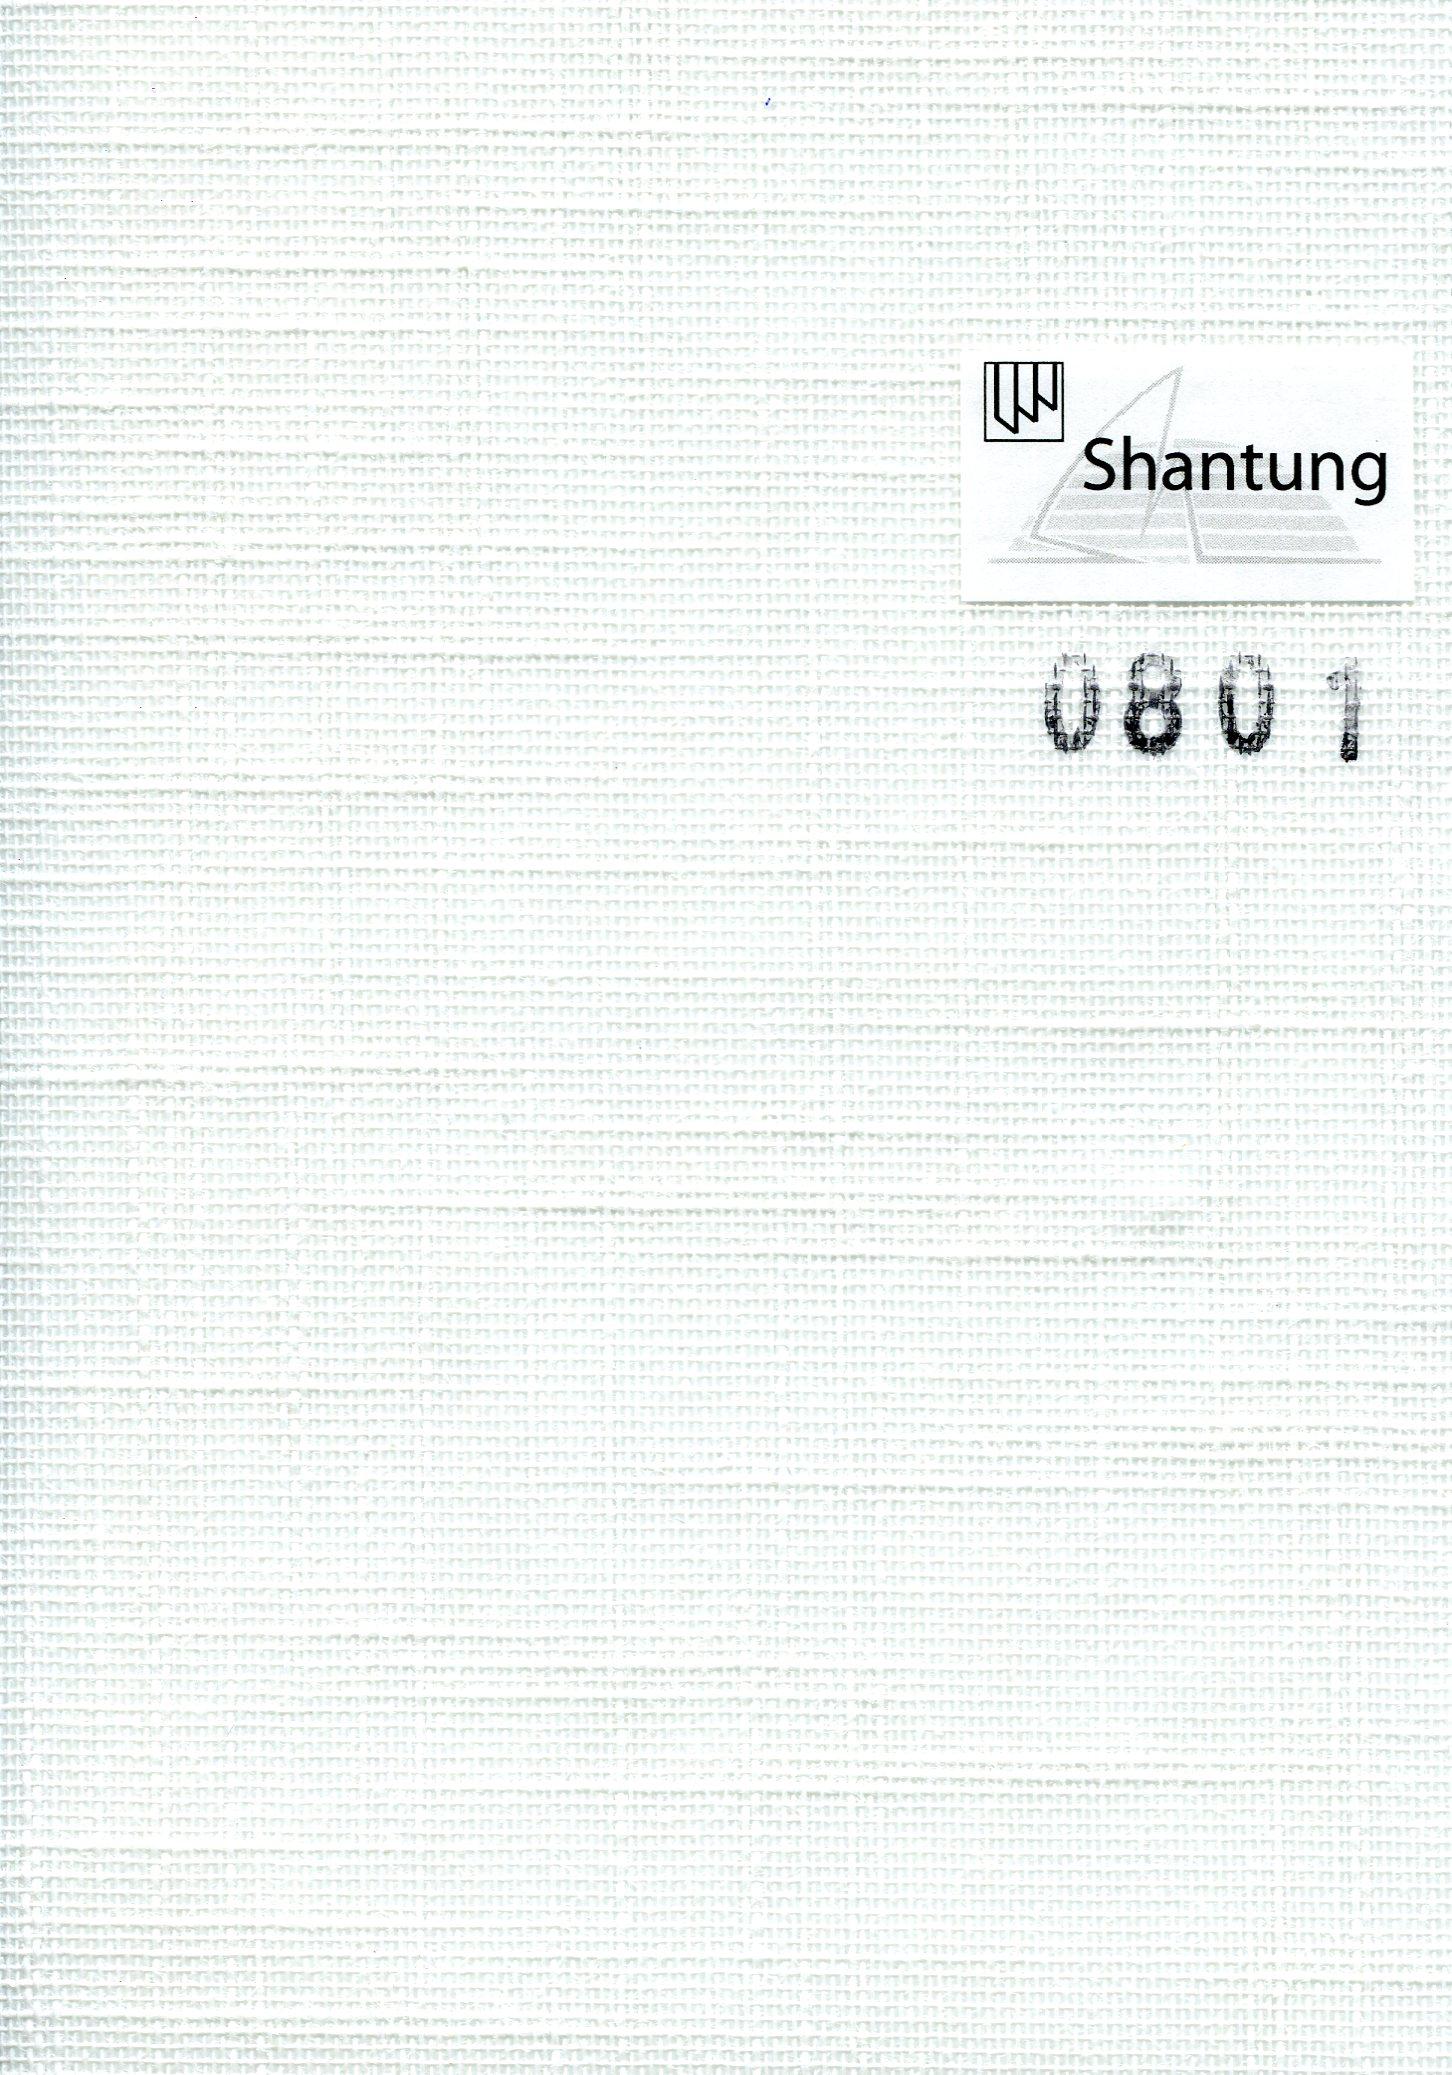 Shantung 0801